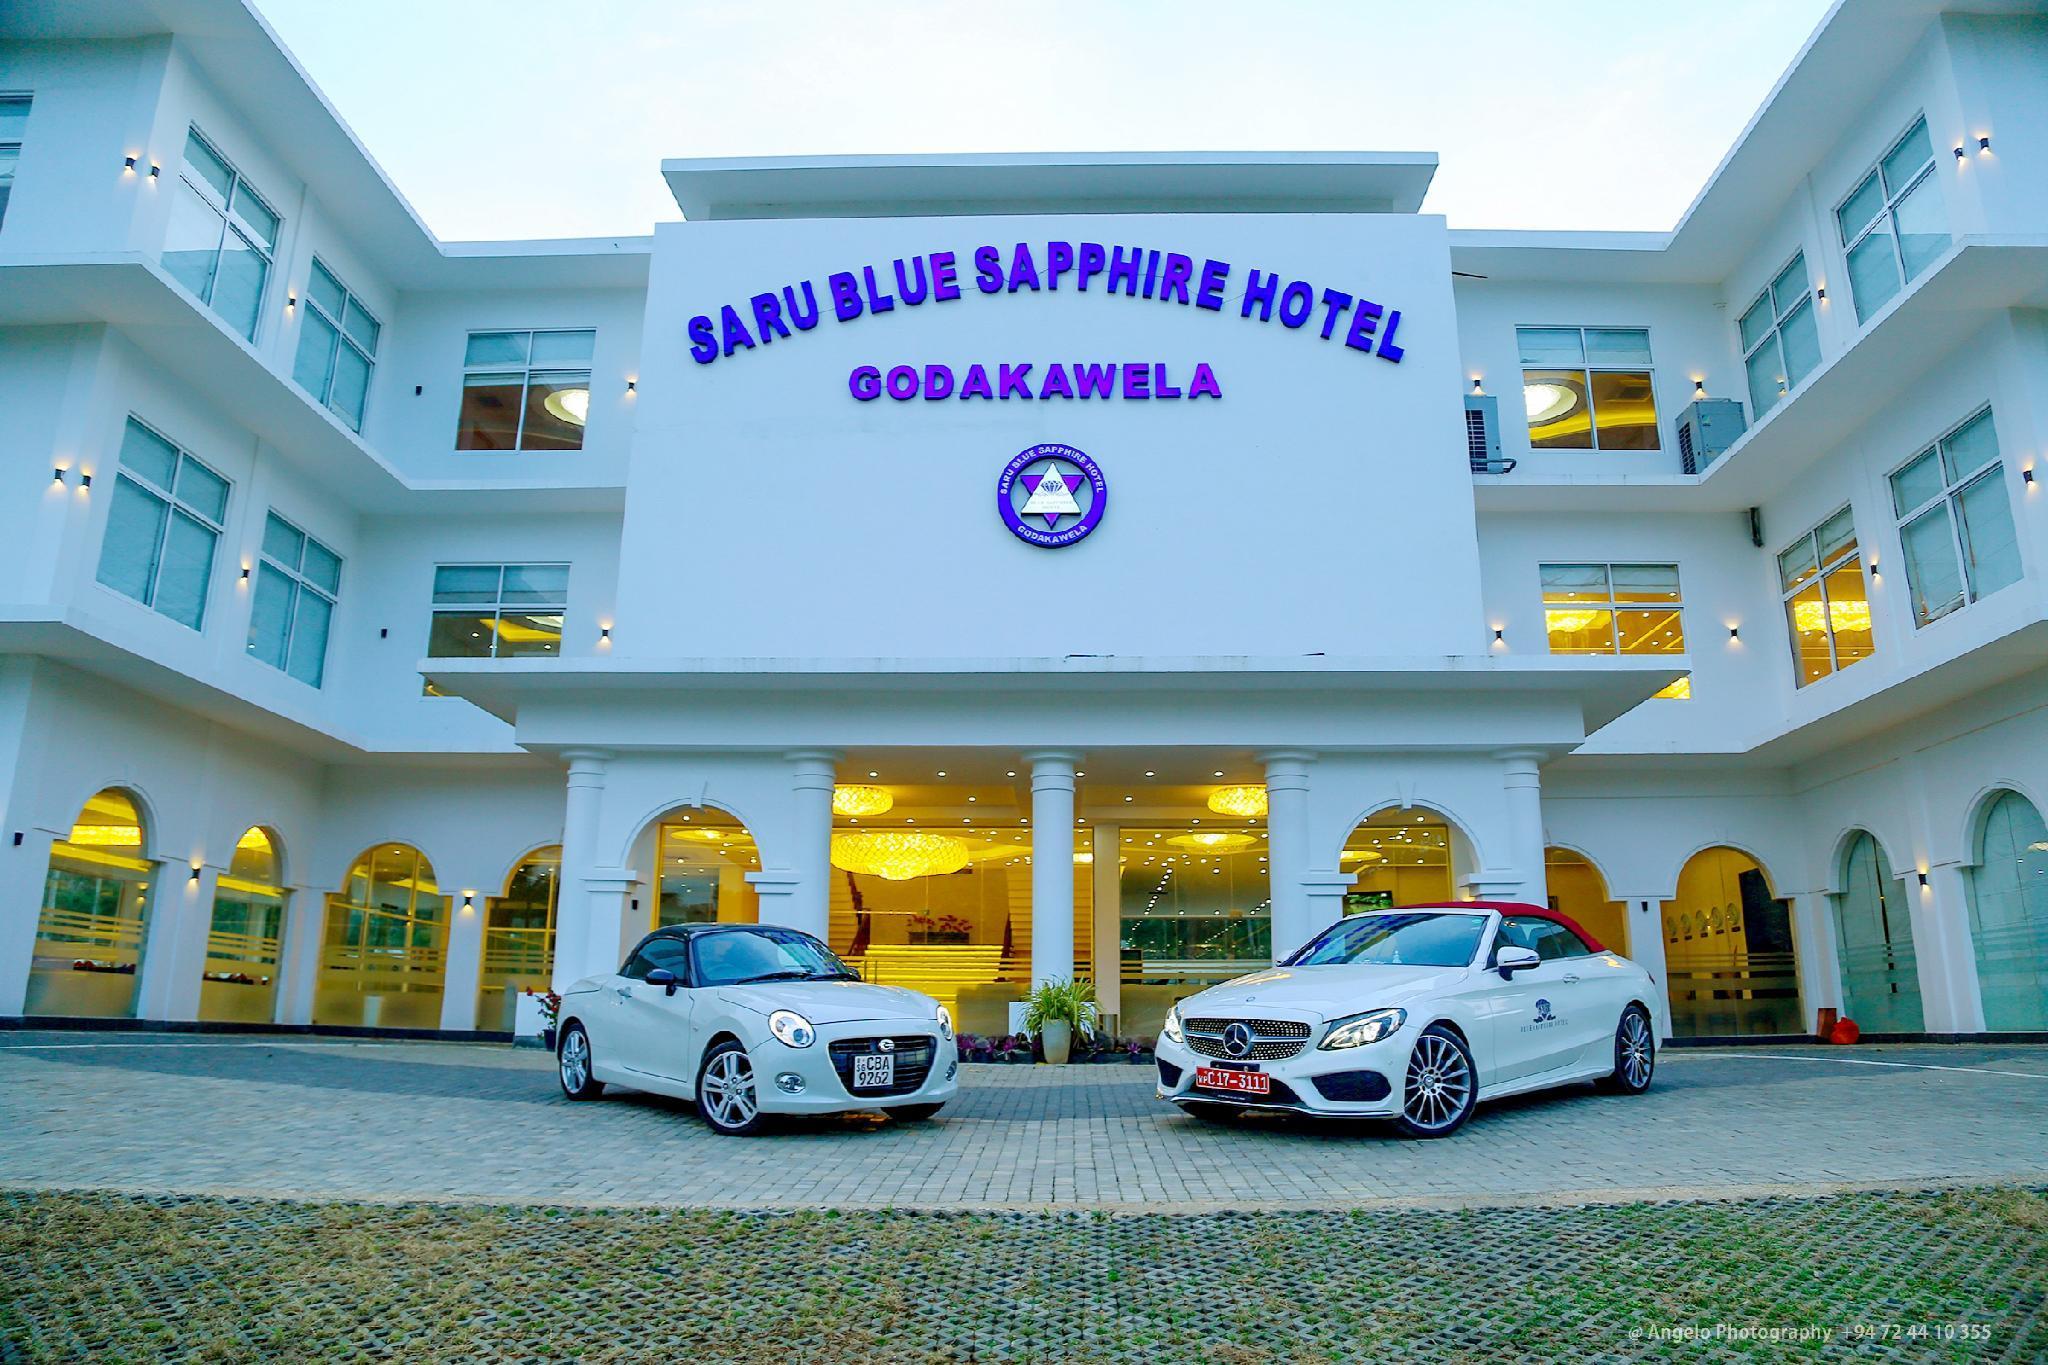 Saru Blue Sapphire Hotel